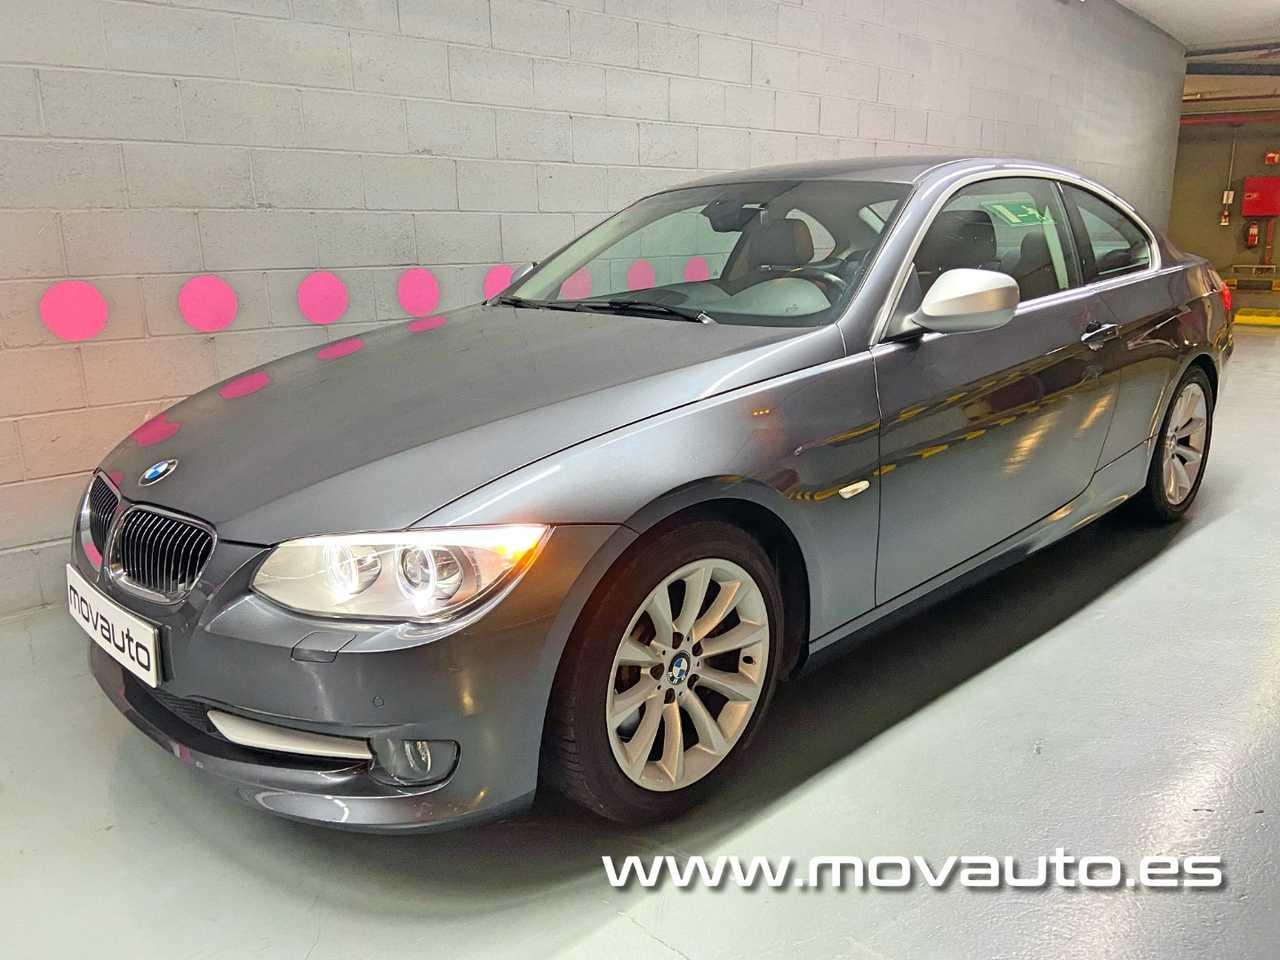 BMW Serie 3 Coupé 335i DKG 306cv   - Foto 1